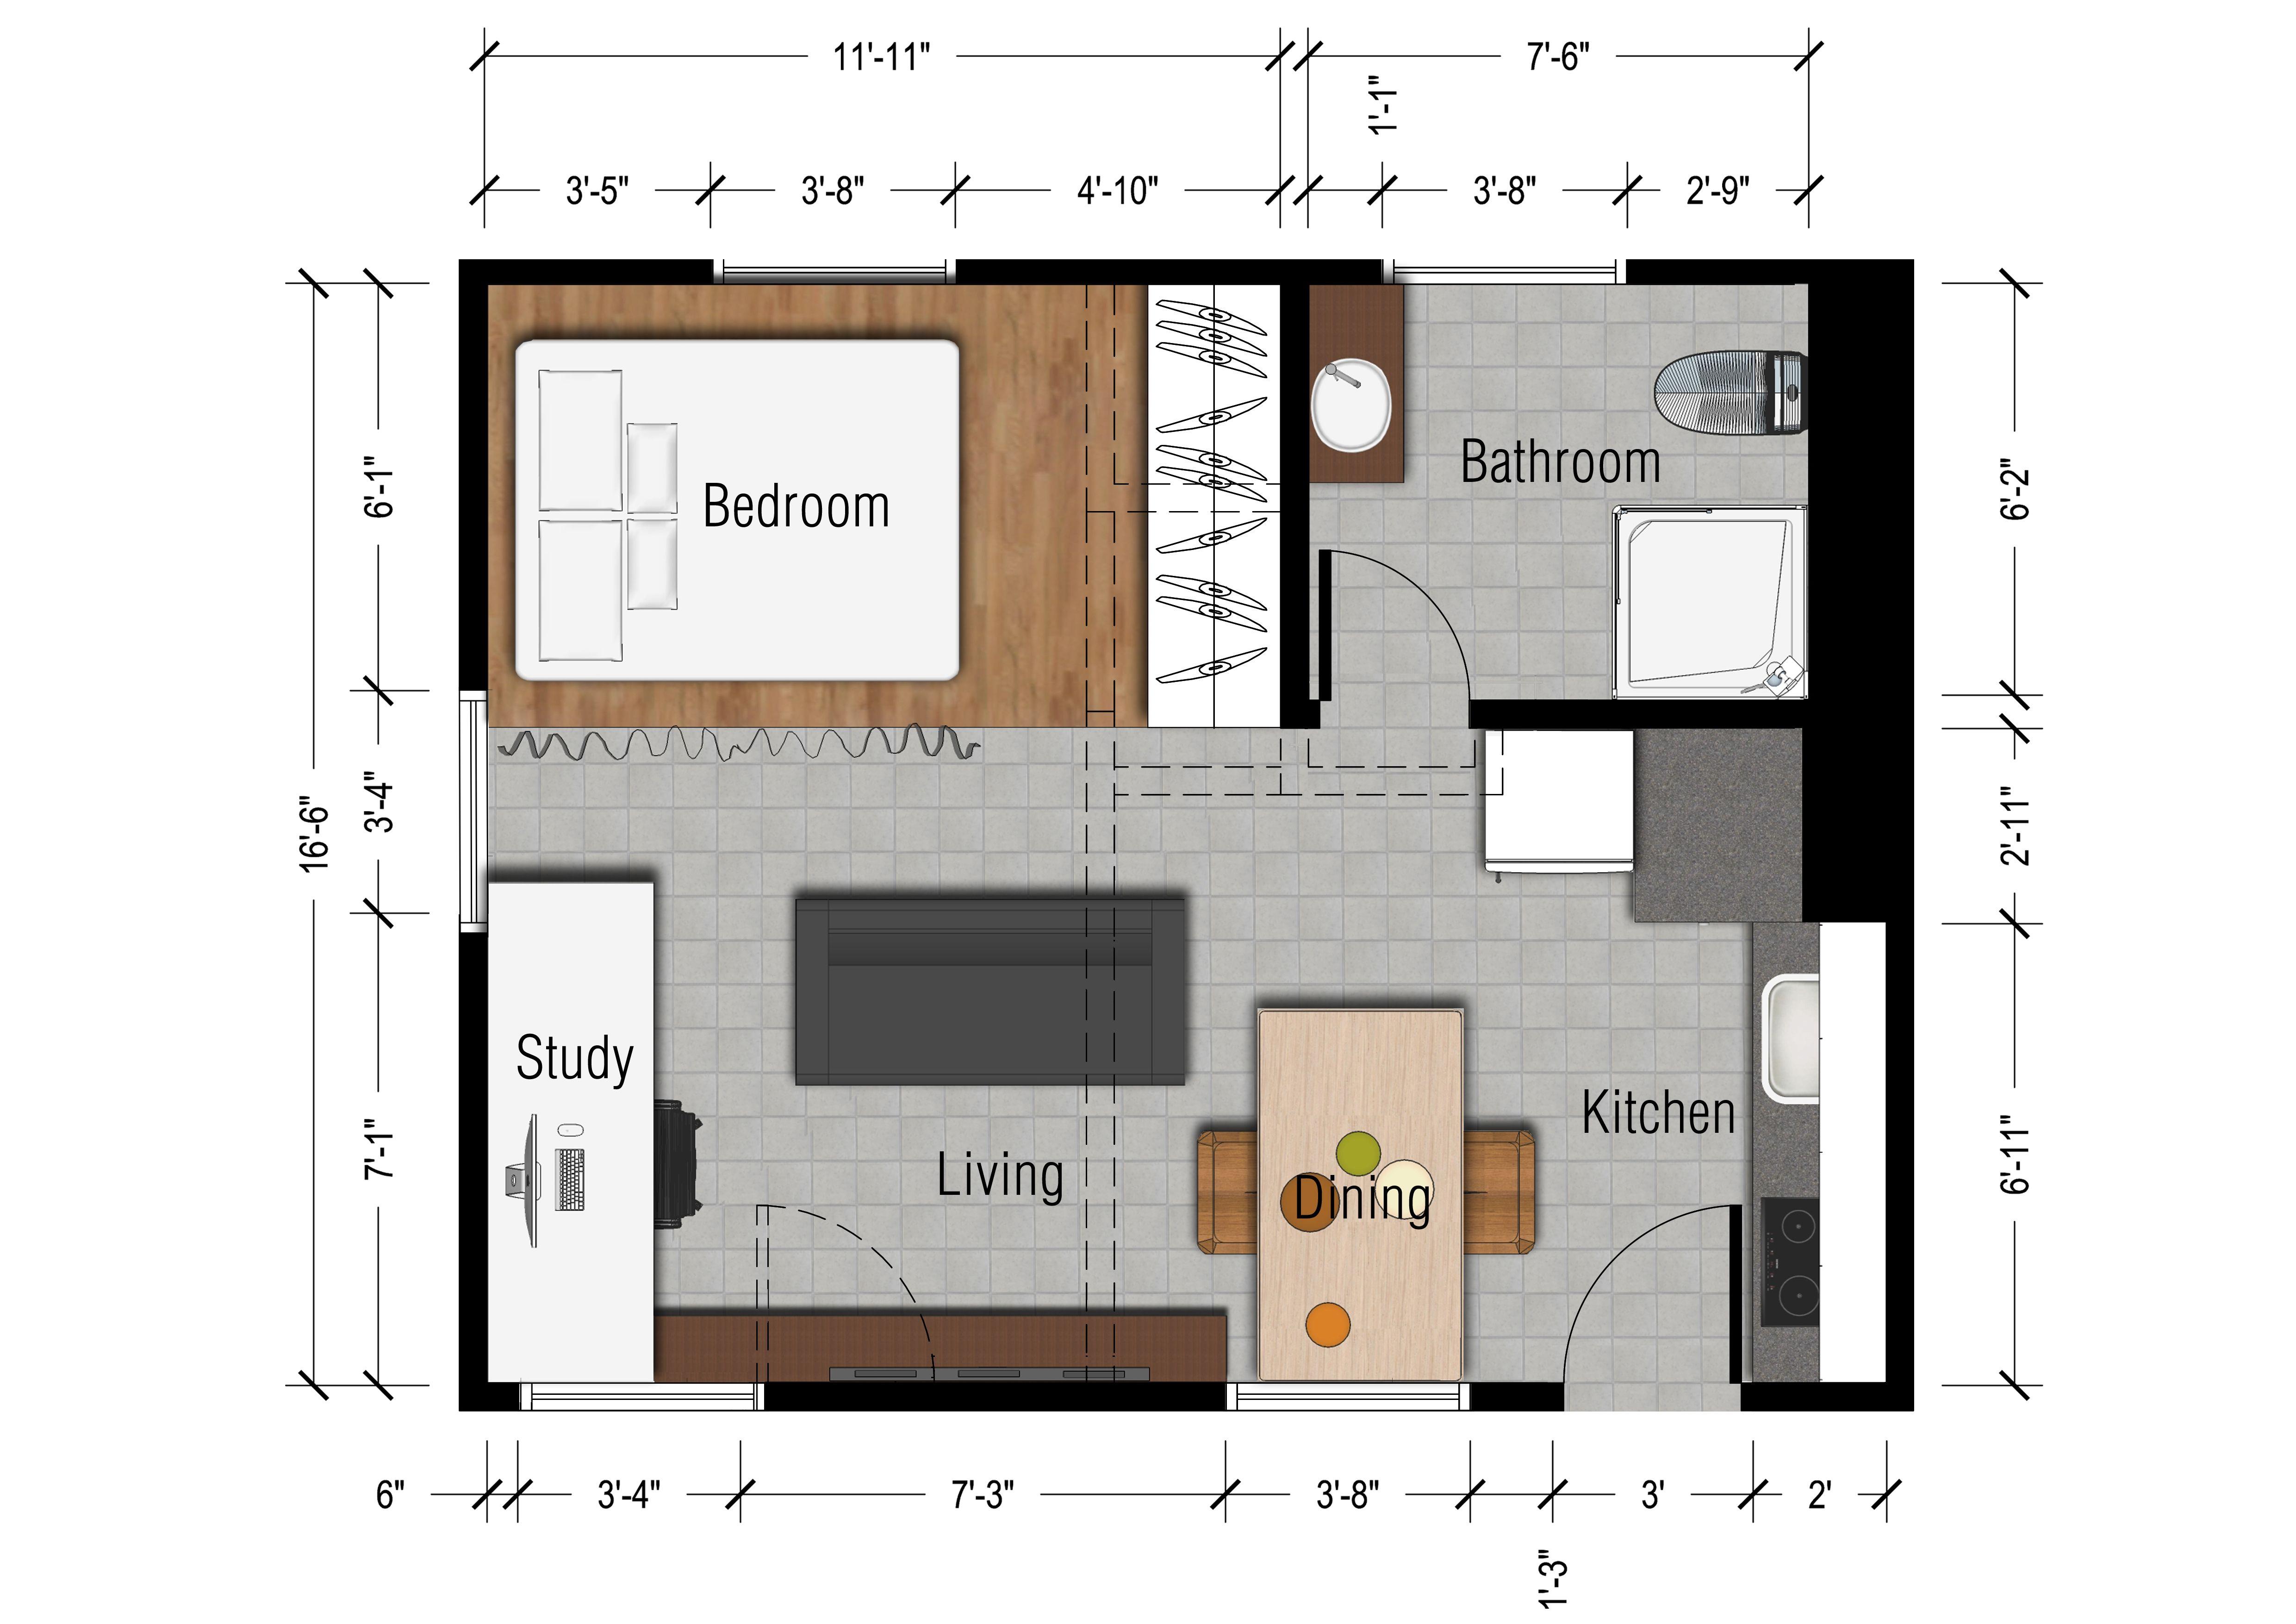 studio apartments floor plan 300 square feet